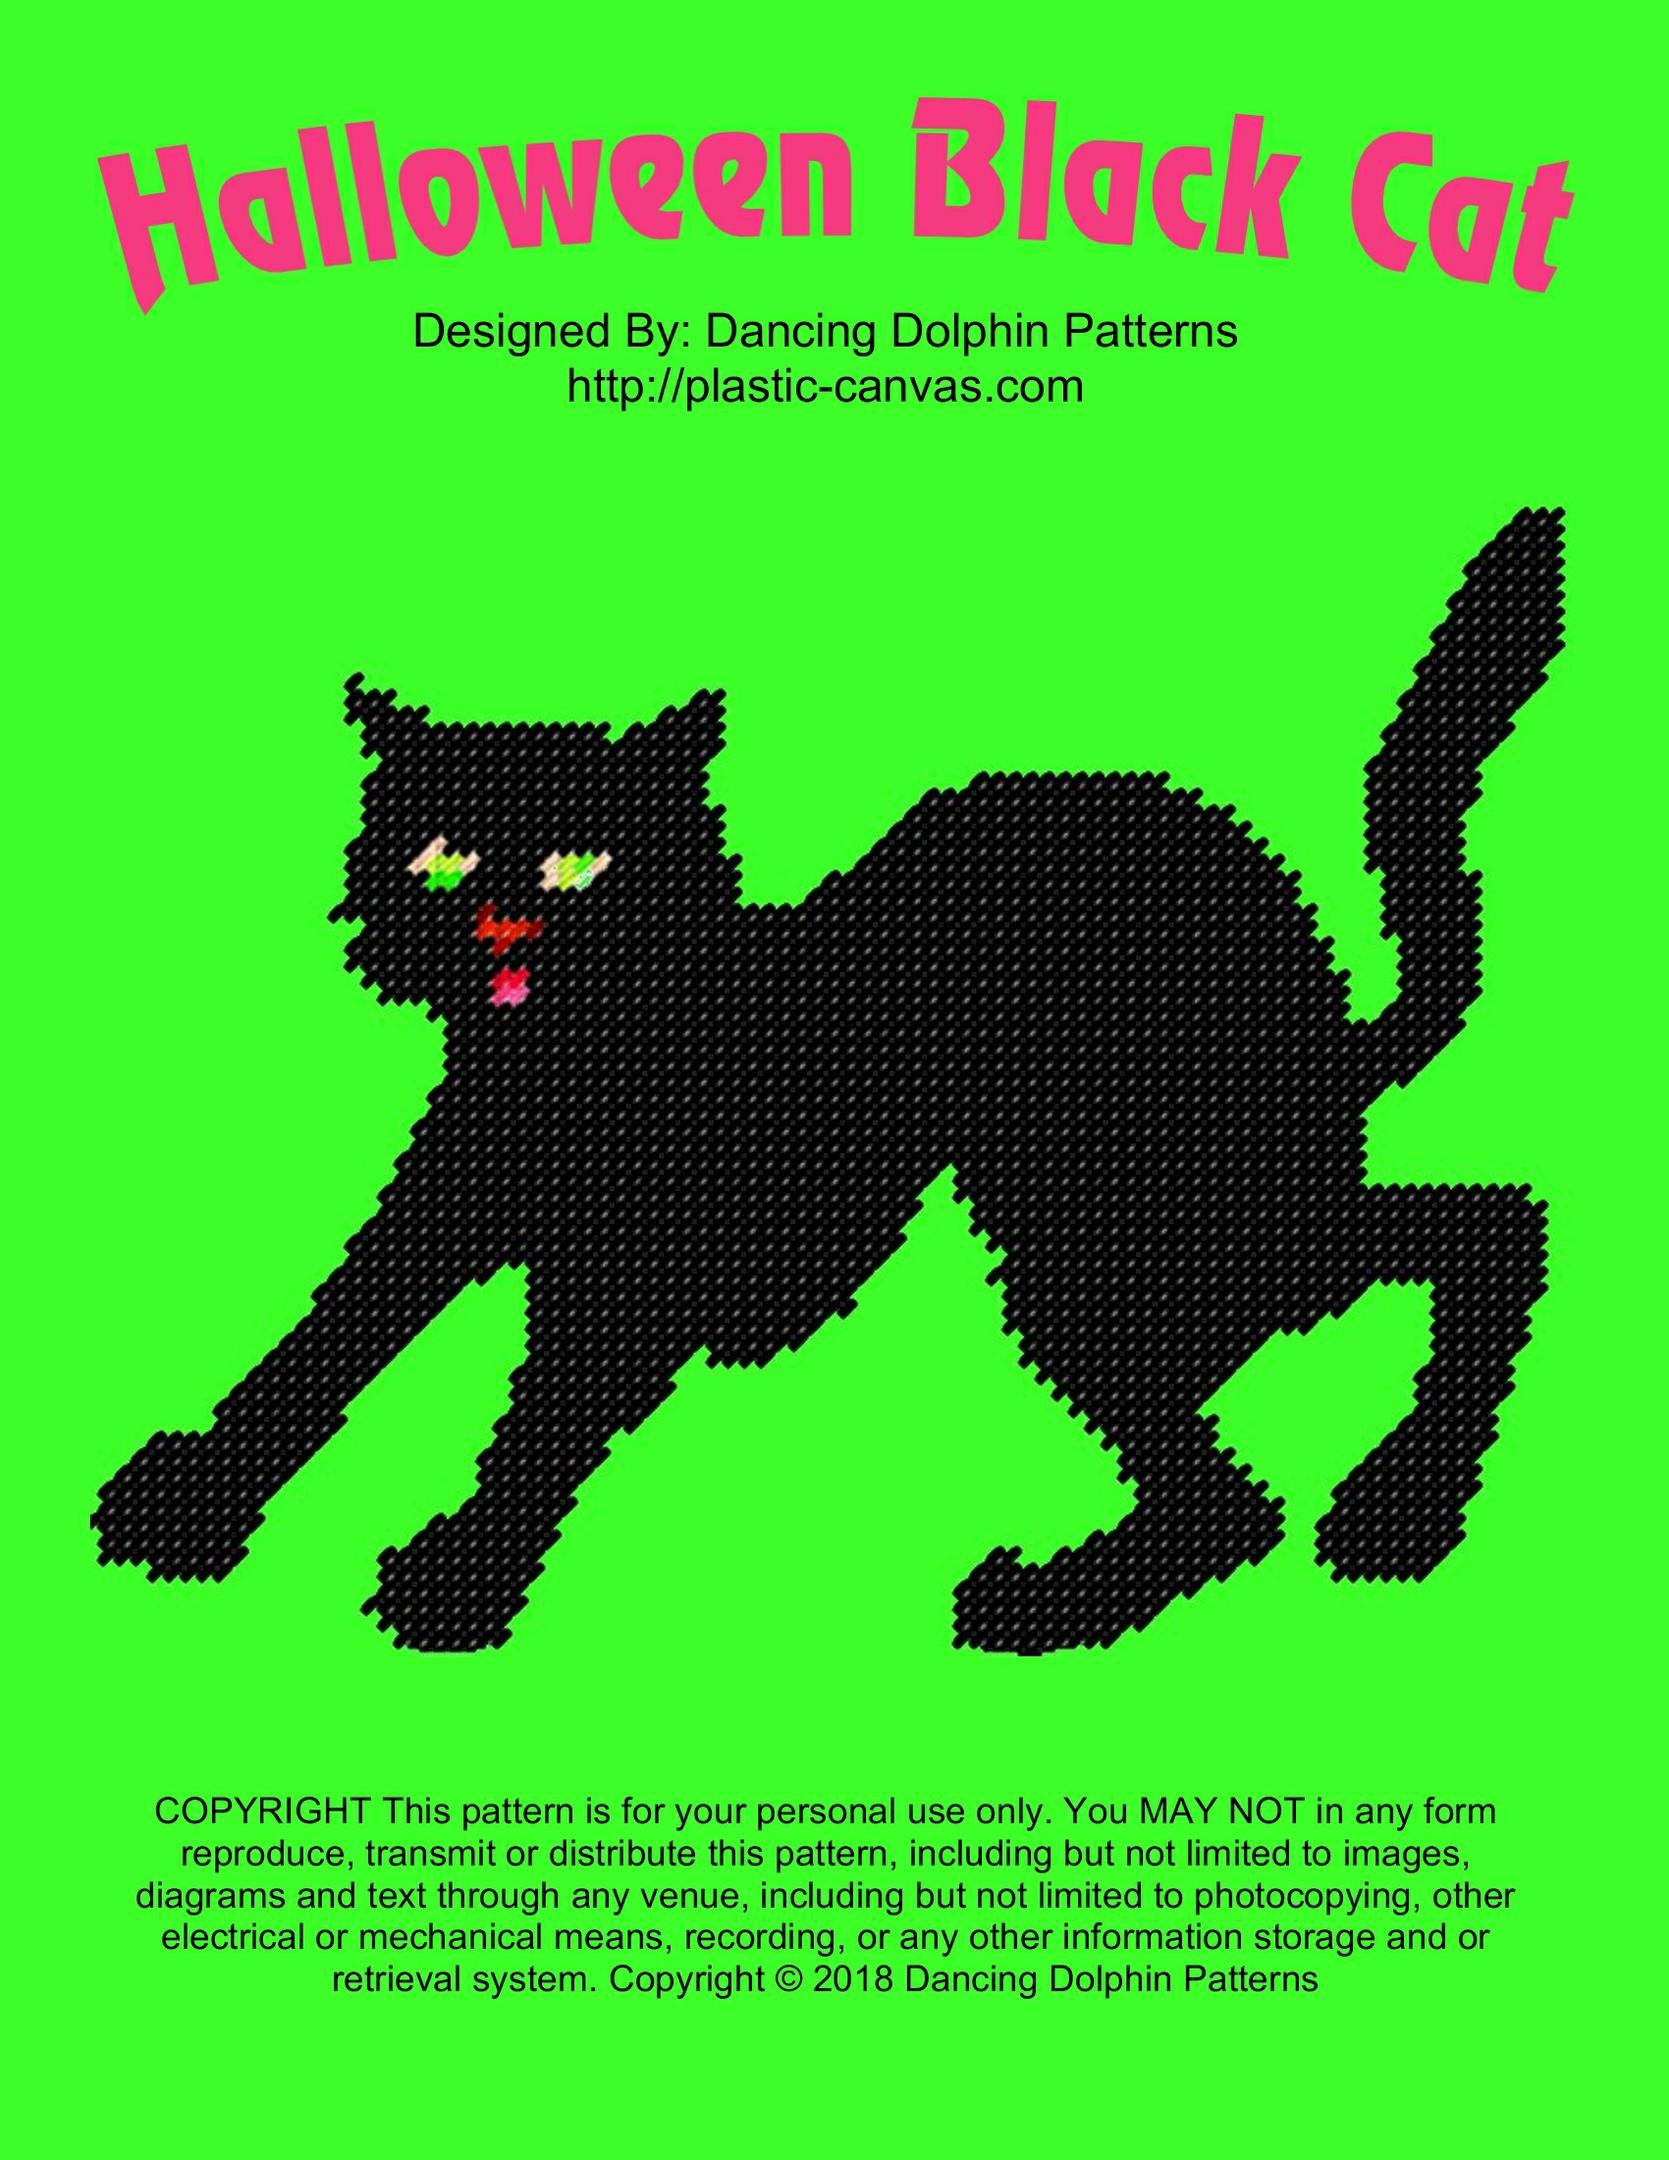 624 - Halloween Black Cat